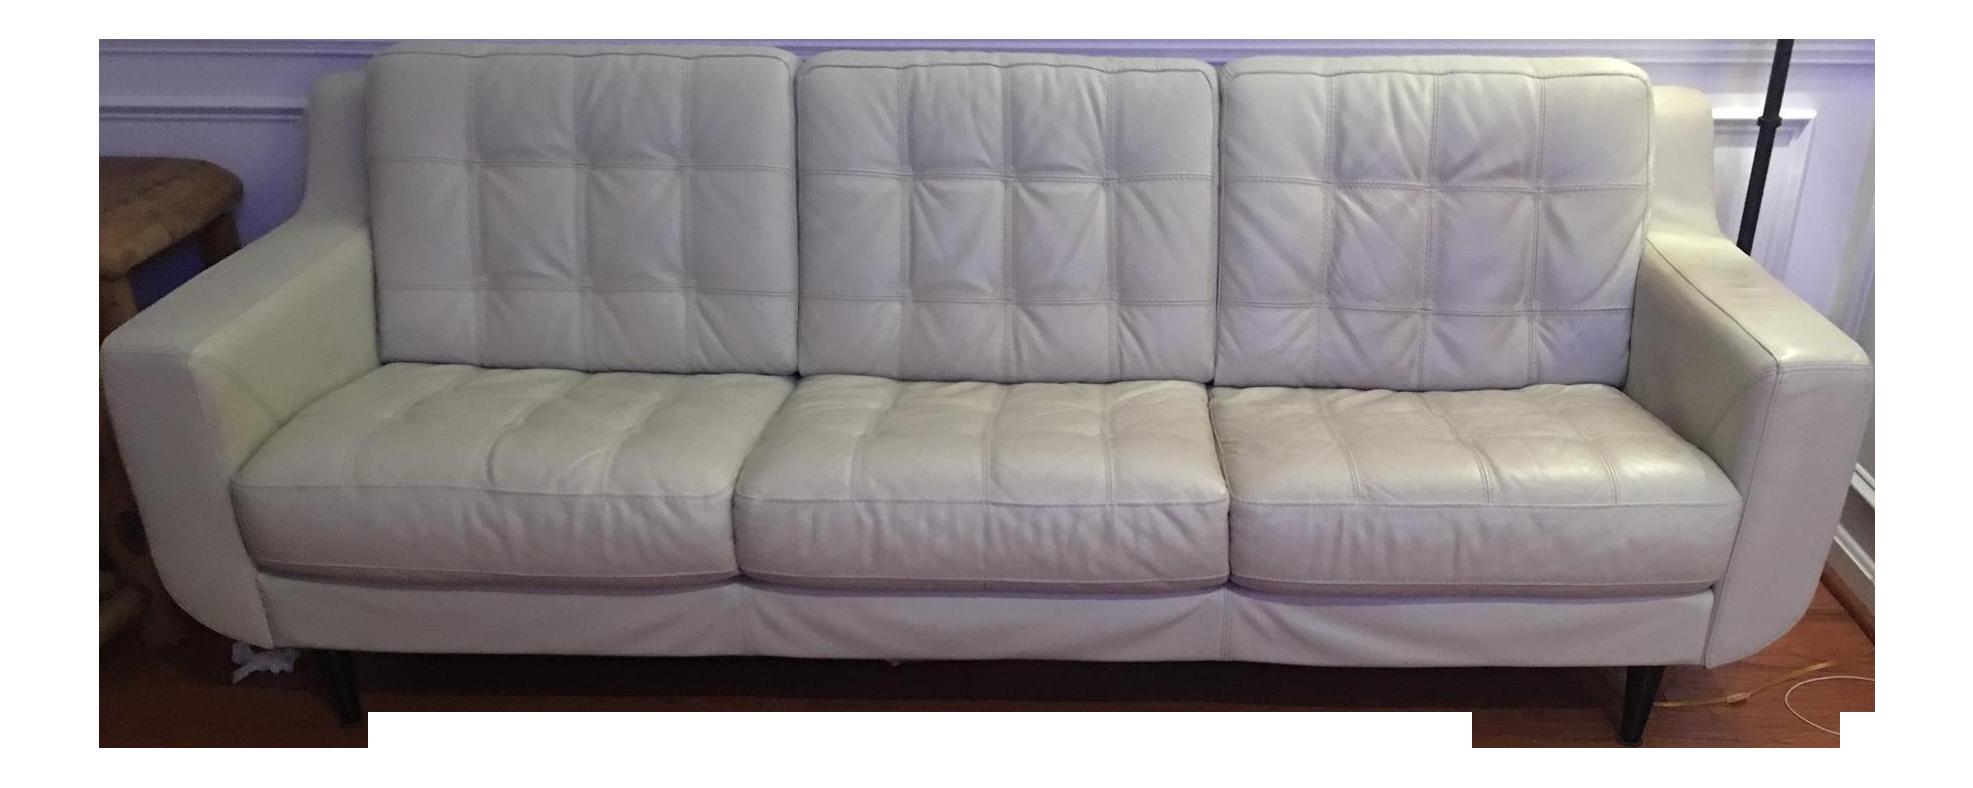 Mid Century Modern Leather Sofa Chairish